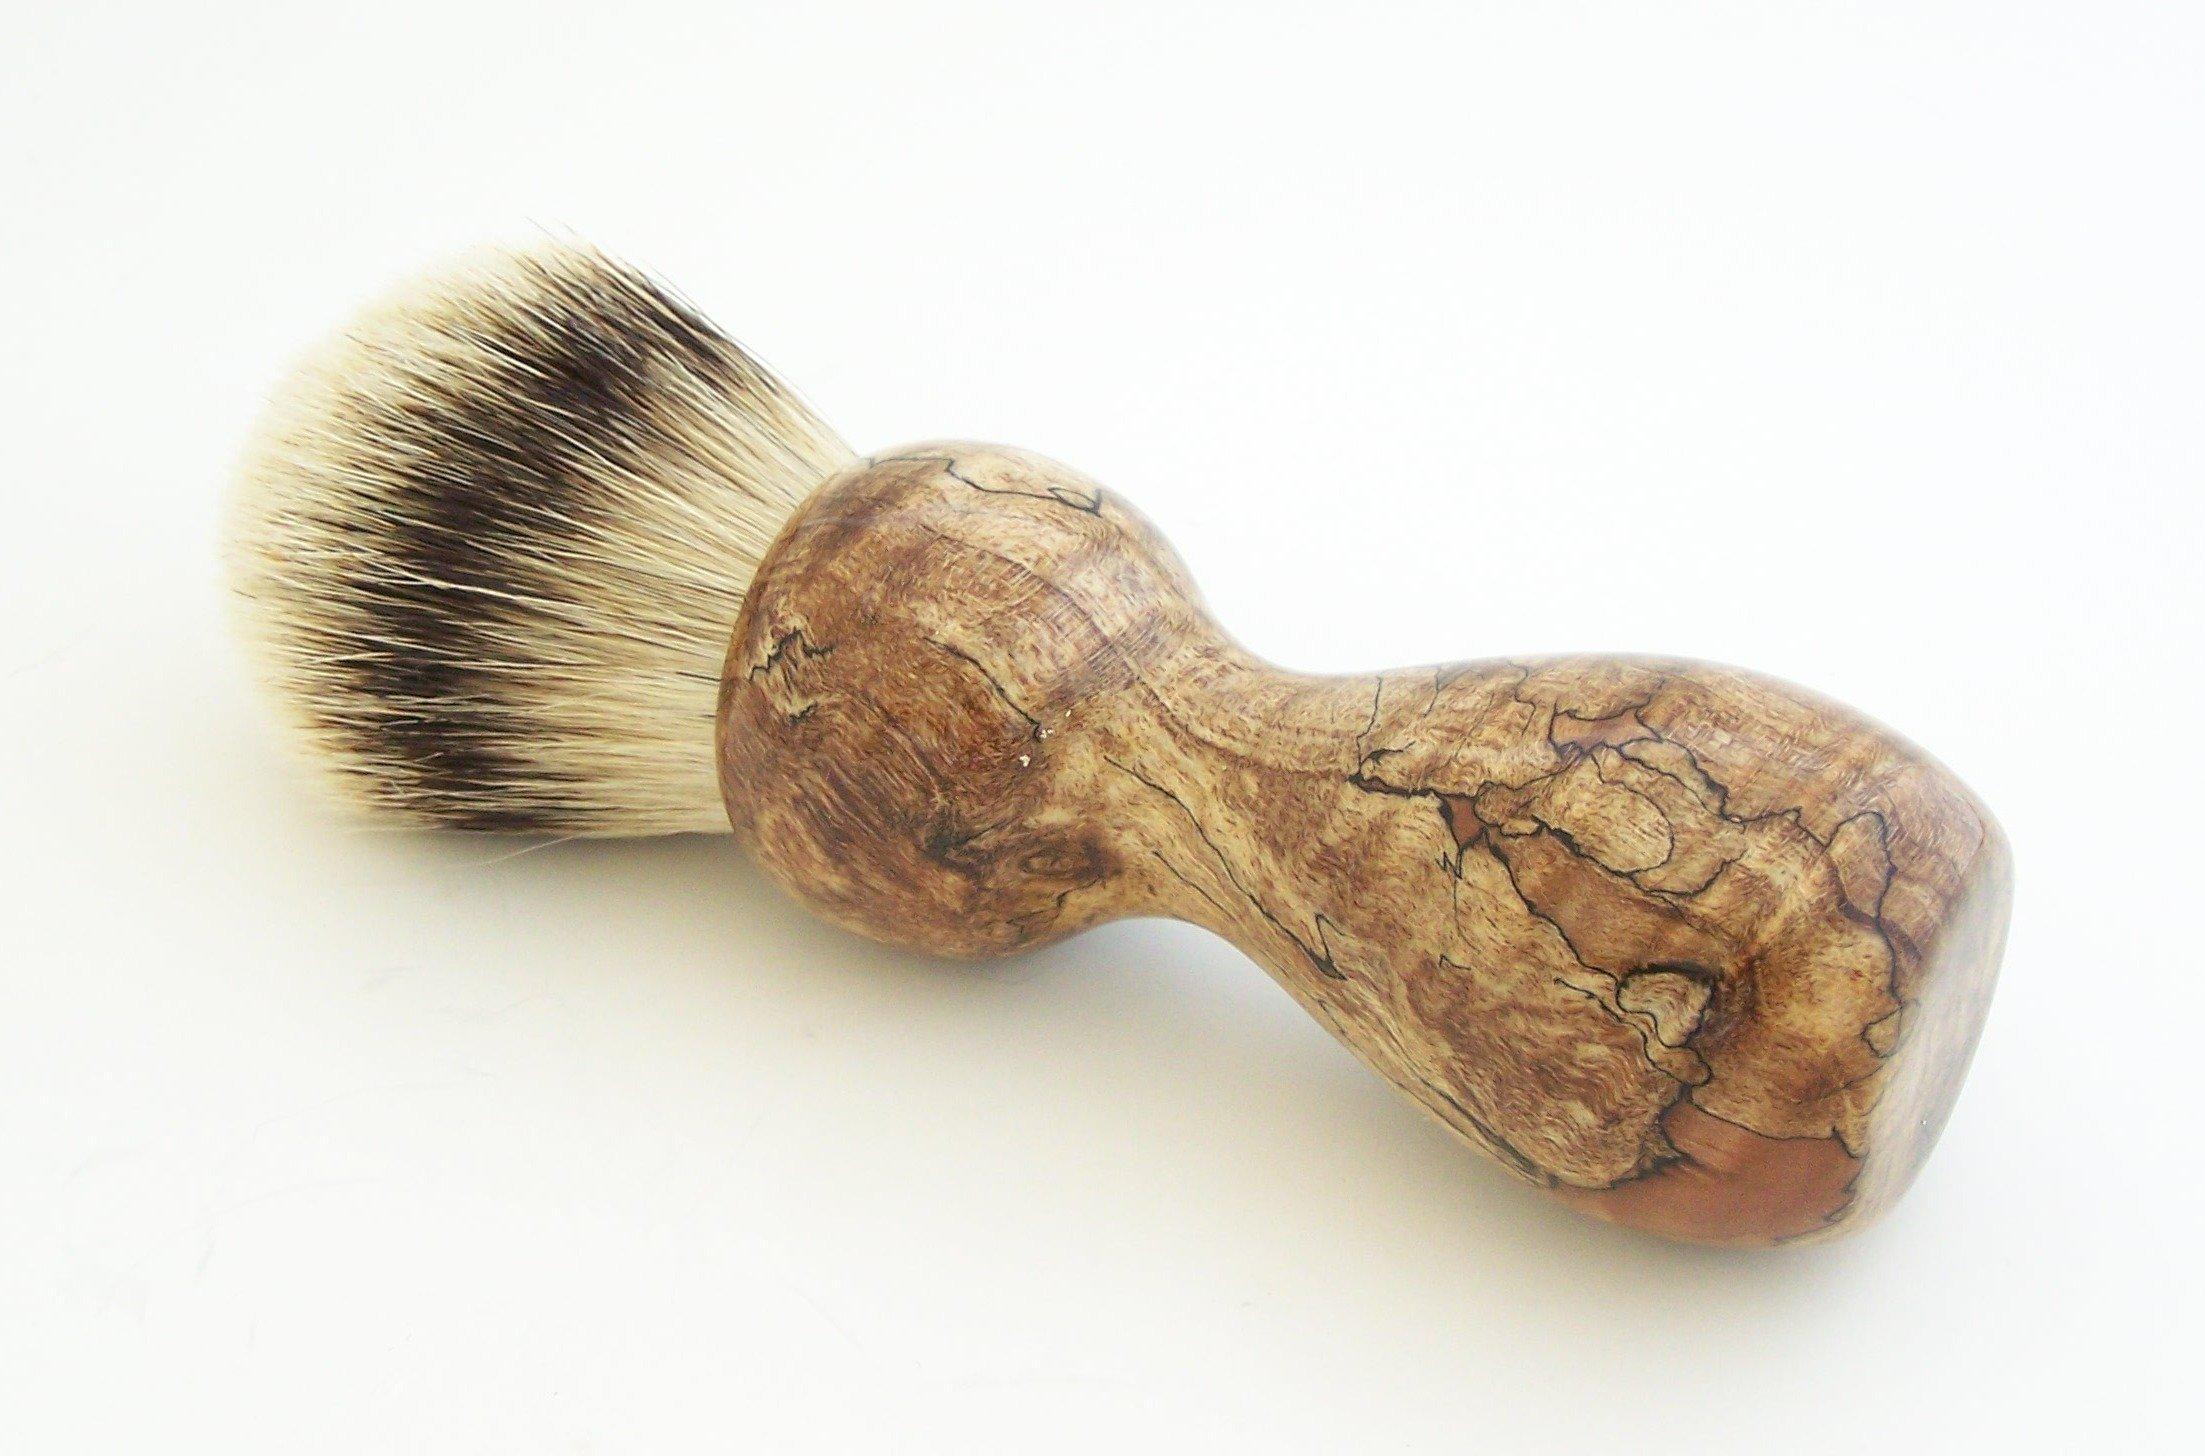 Stabilized Spalted Maple Burl Wood 24mm Super Silvertip Shaving Brush (M13)